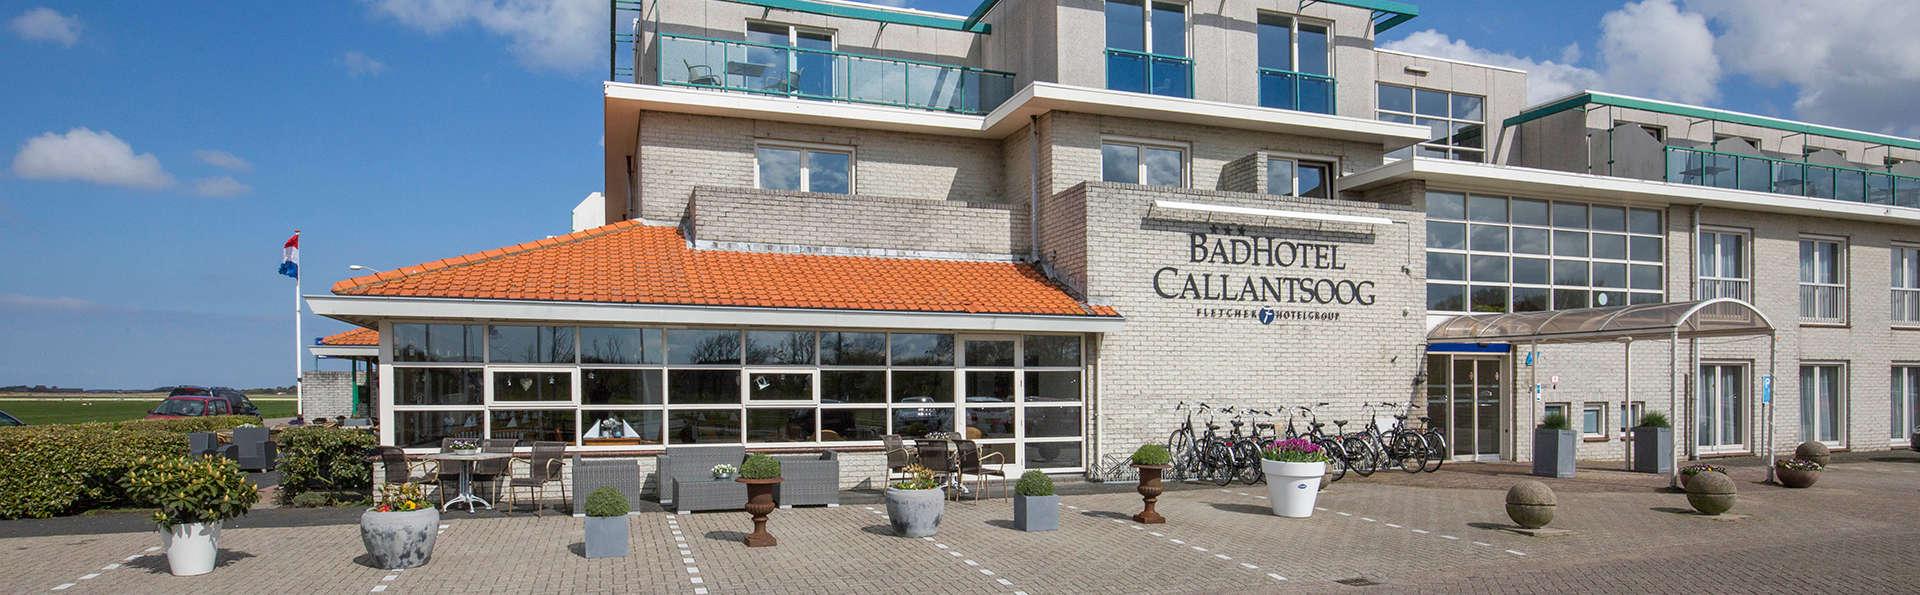 Fletcher Badhotel Callantsoog - EDIT_NEW_front1.jpg